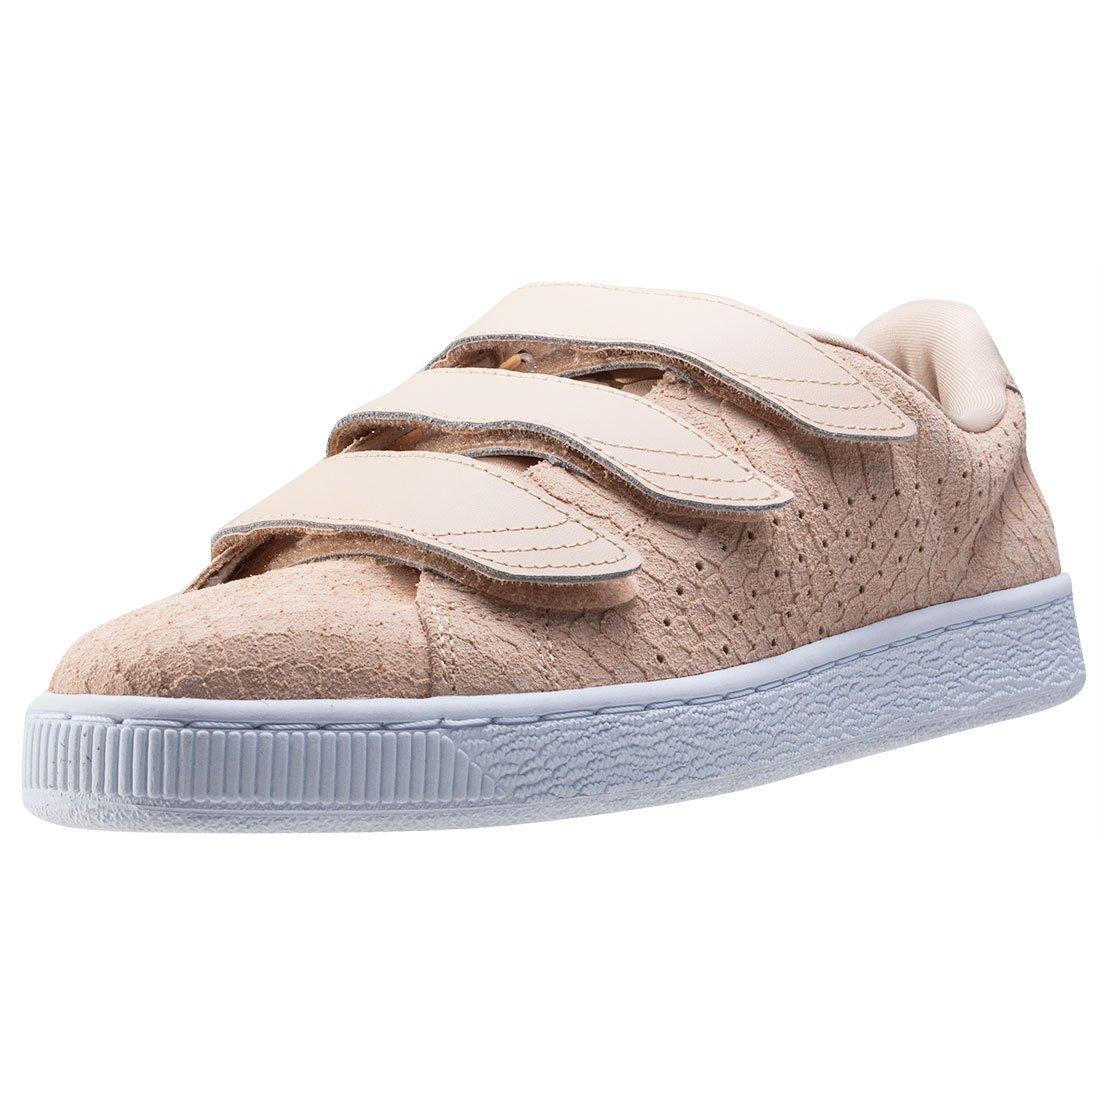 PUMA Basket Strap Exotic Skin Damen Sneaker Nude: